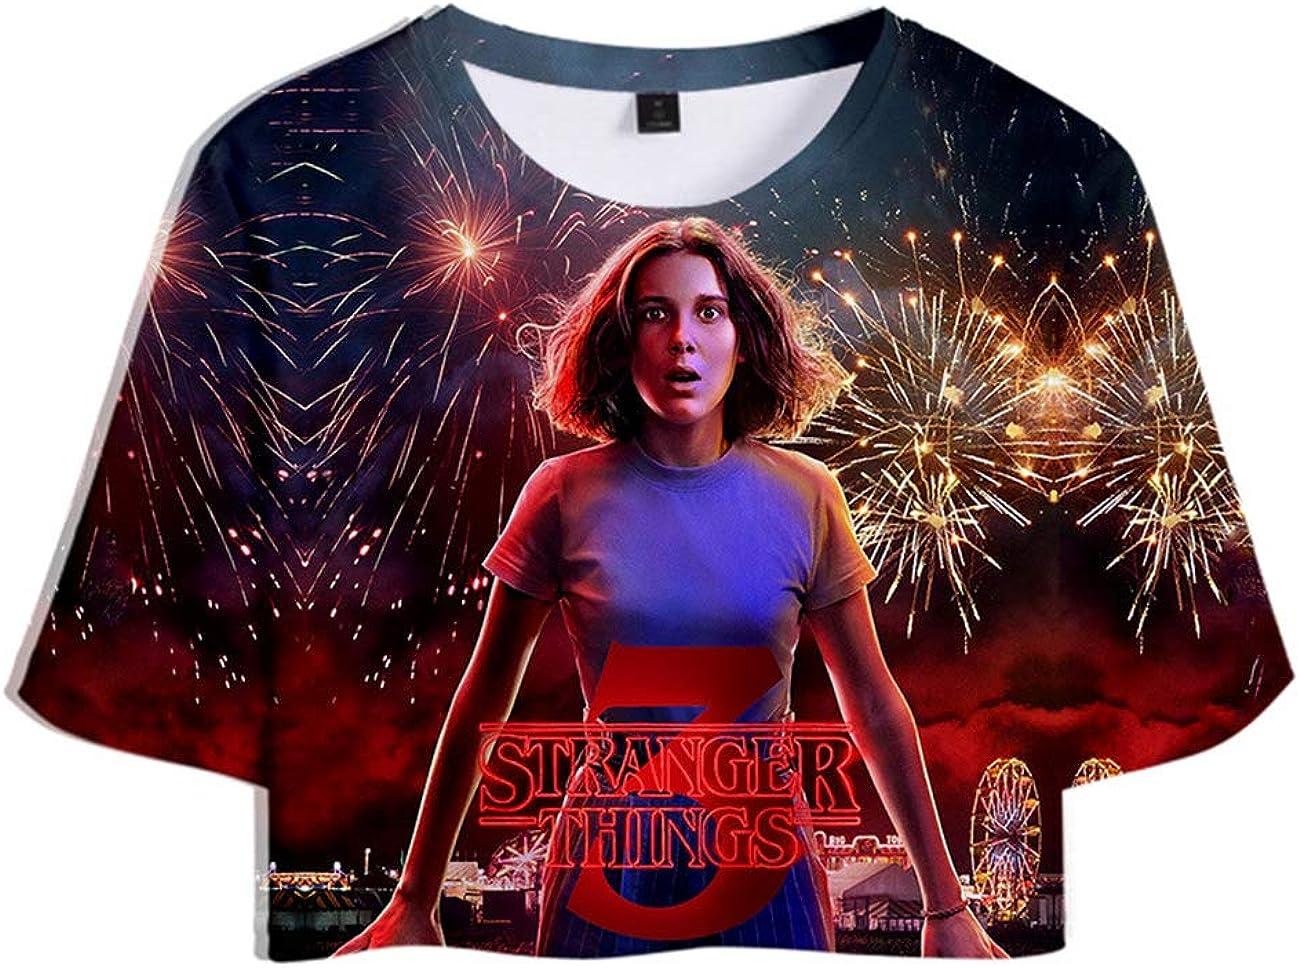 Friends Dont Lie T-Shirt Maniche Corte Estate Tops Tee Camicetta Camicia Blusa Stampa 3D Stranger Things Maglietta per Donna